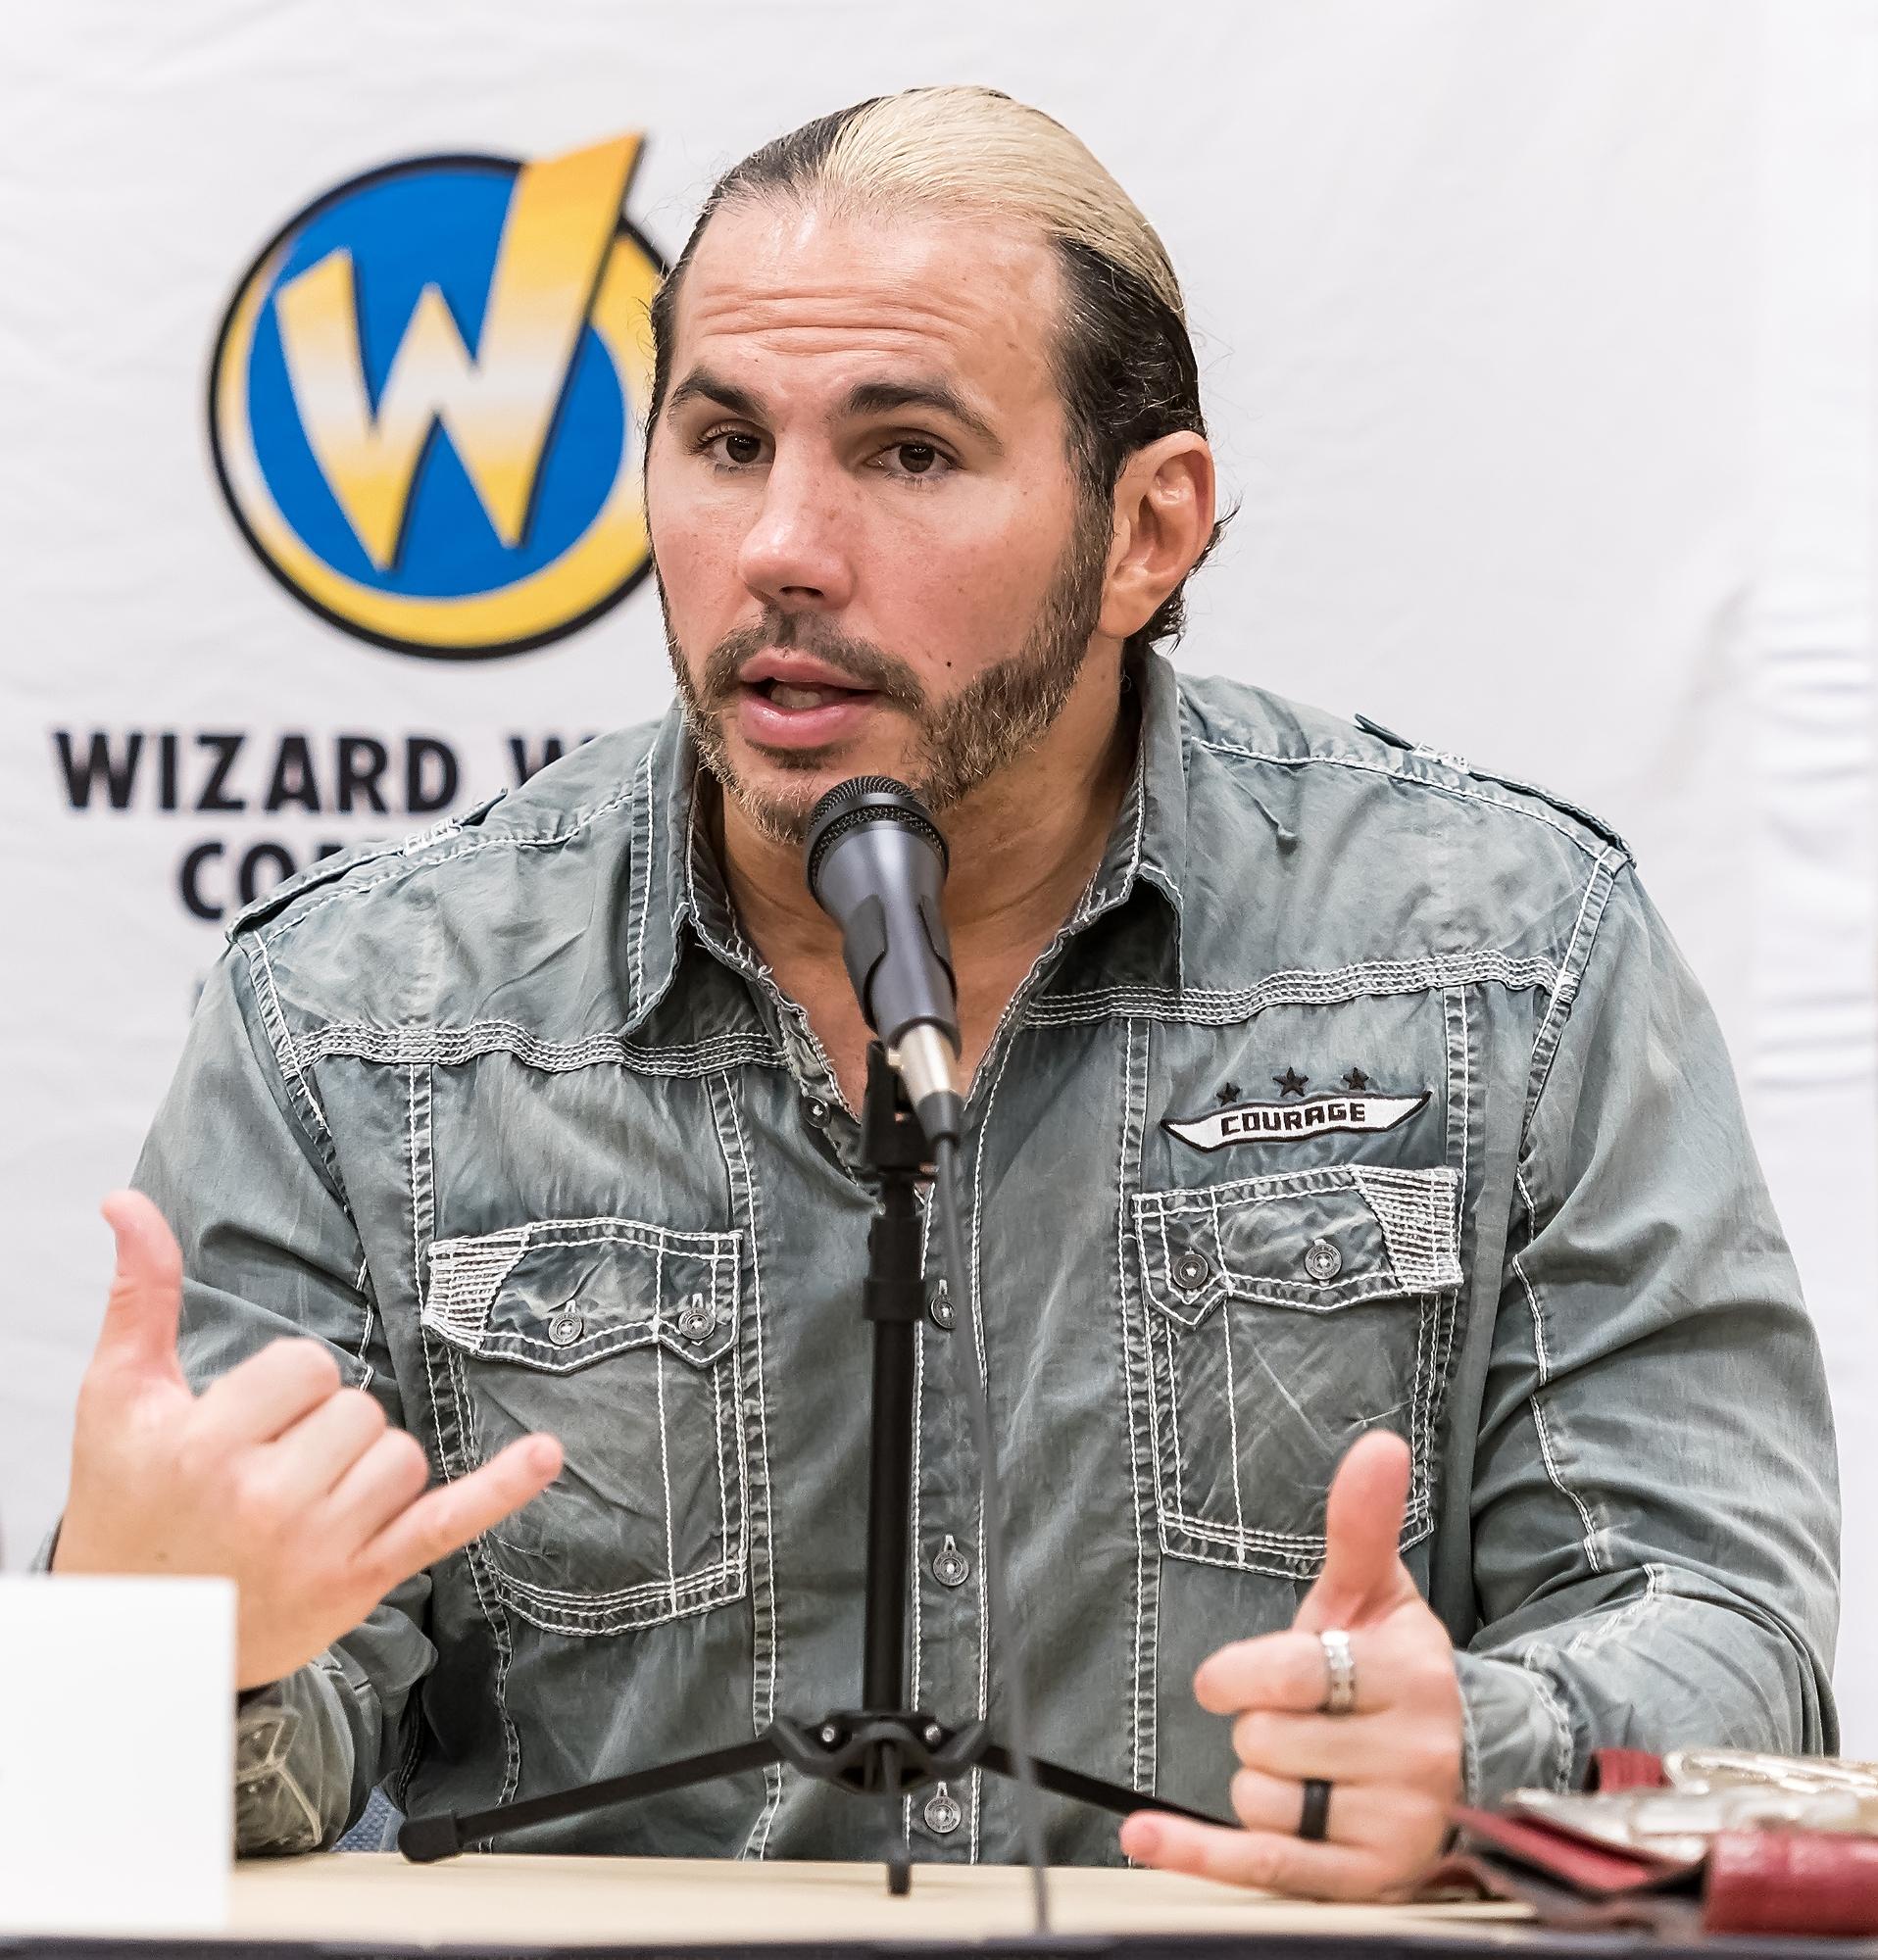 2017 Wizard World Comic Con Philadelphia